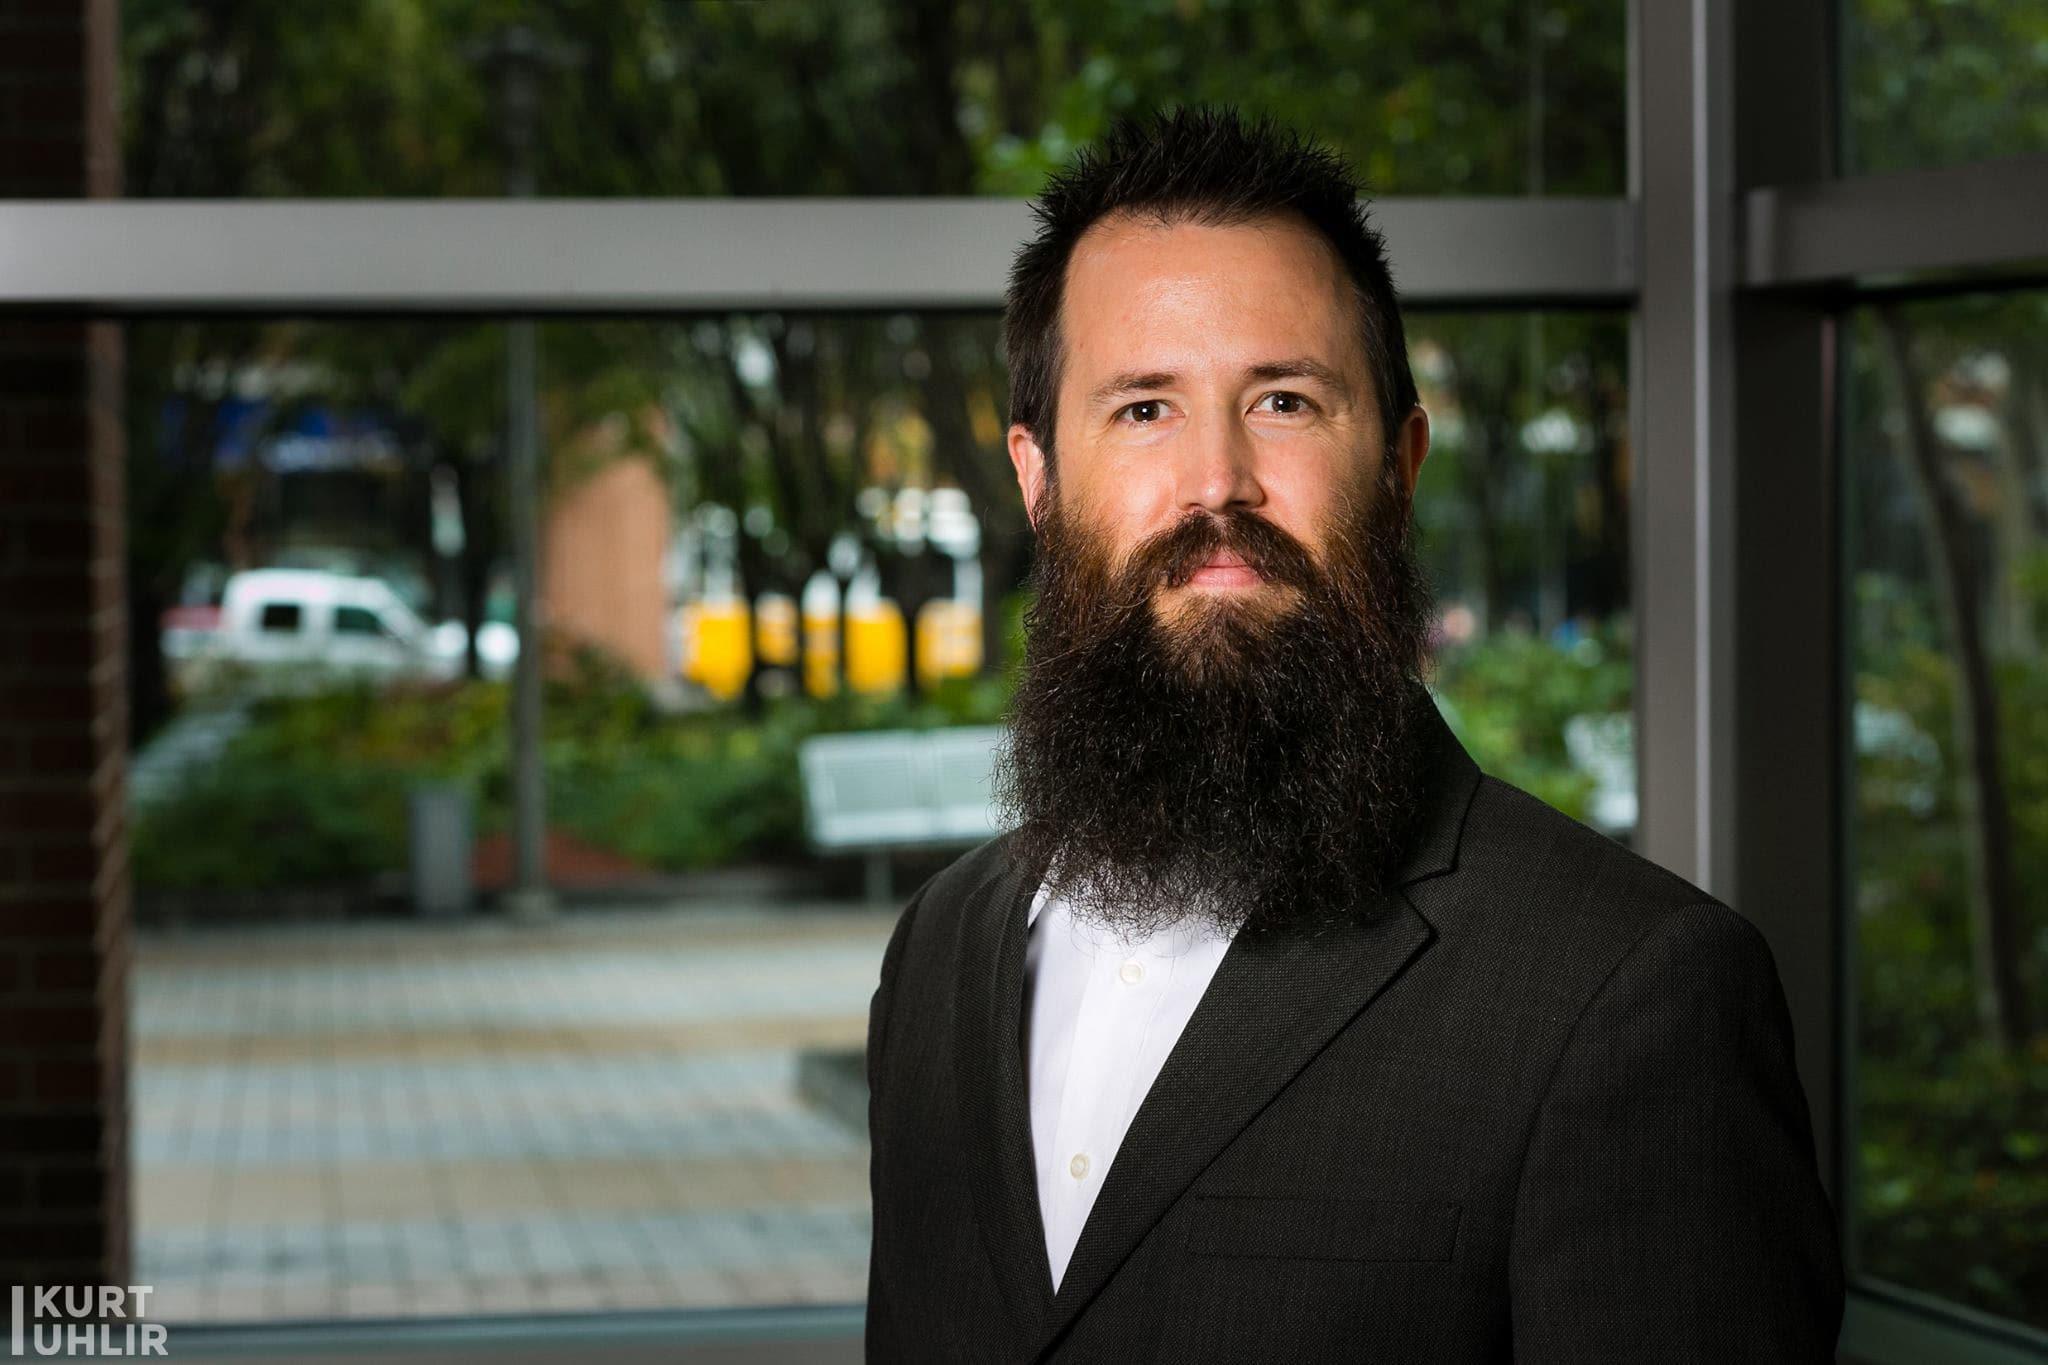 Kurt Uhlir bearded headshot - fully operational battle beard